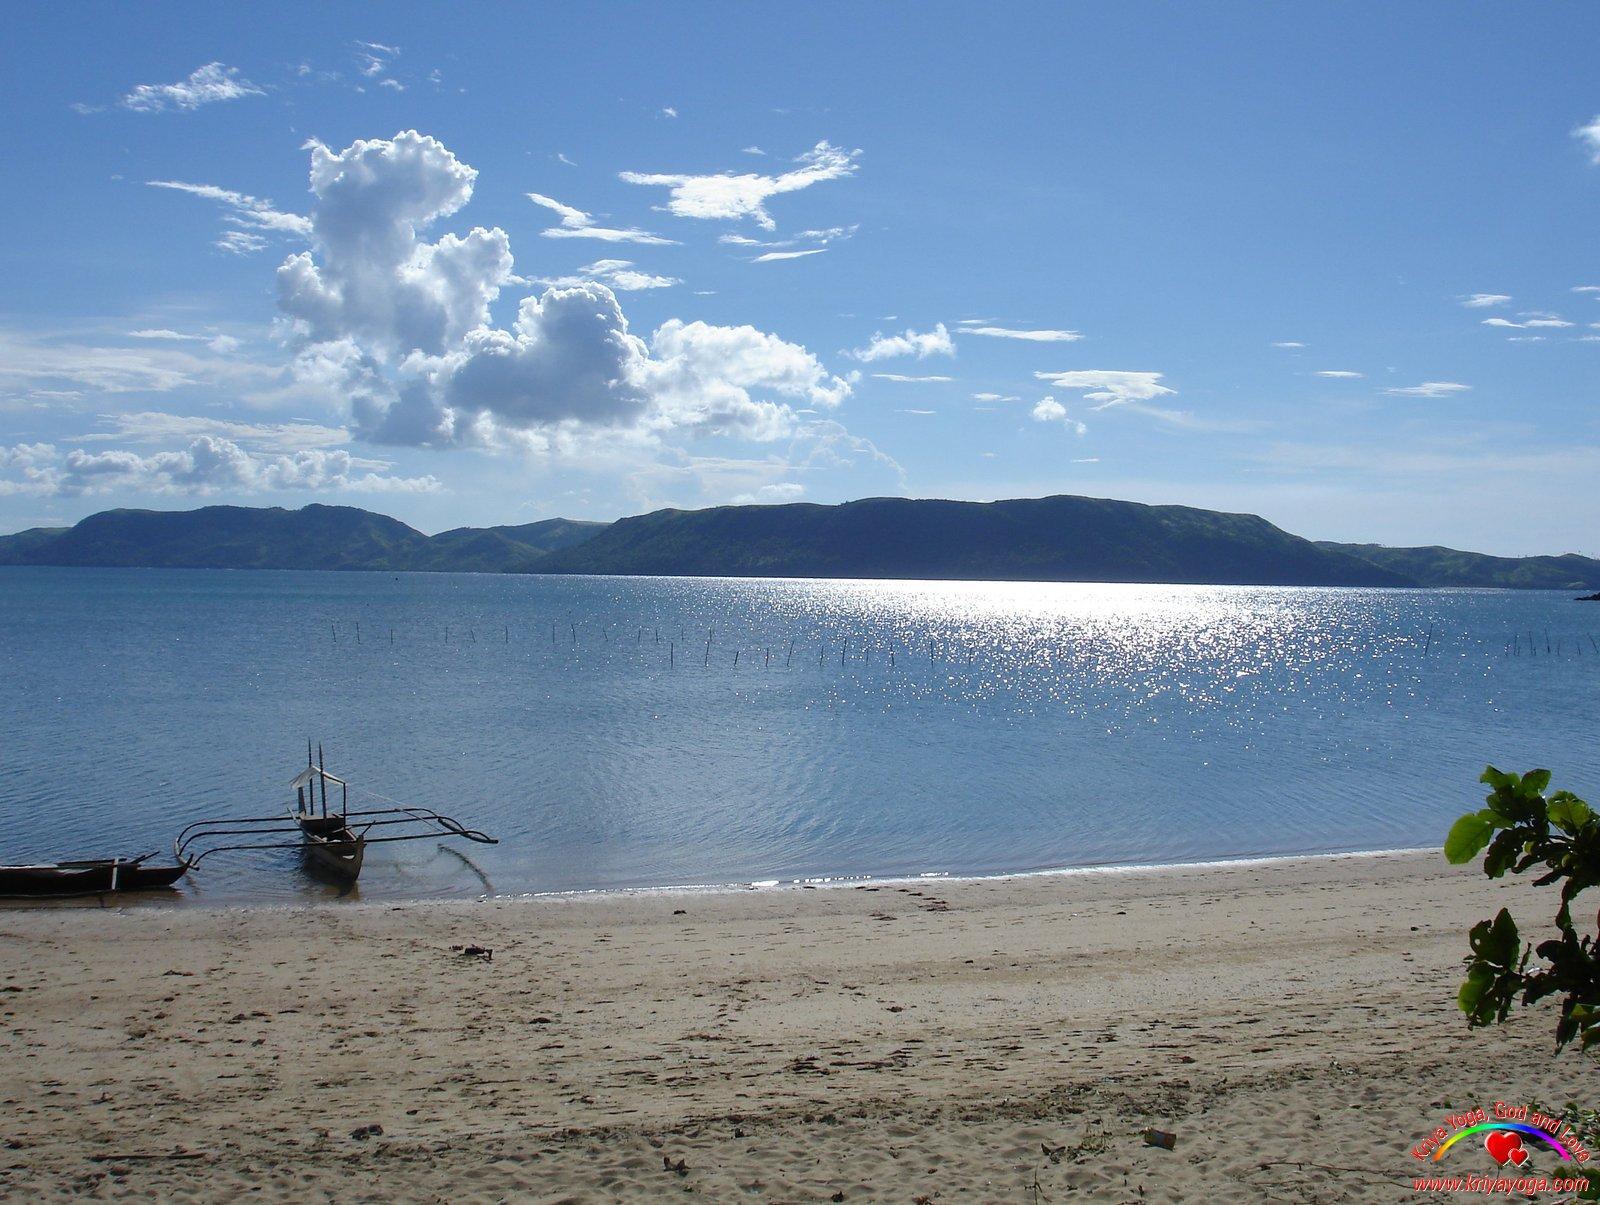 Tropical Beaches Beautiful Beach Scenery Bicol Pacific 352046 1600 1600x1205